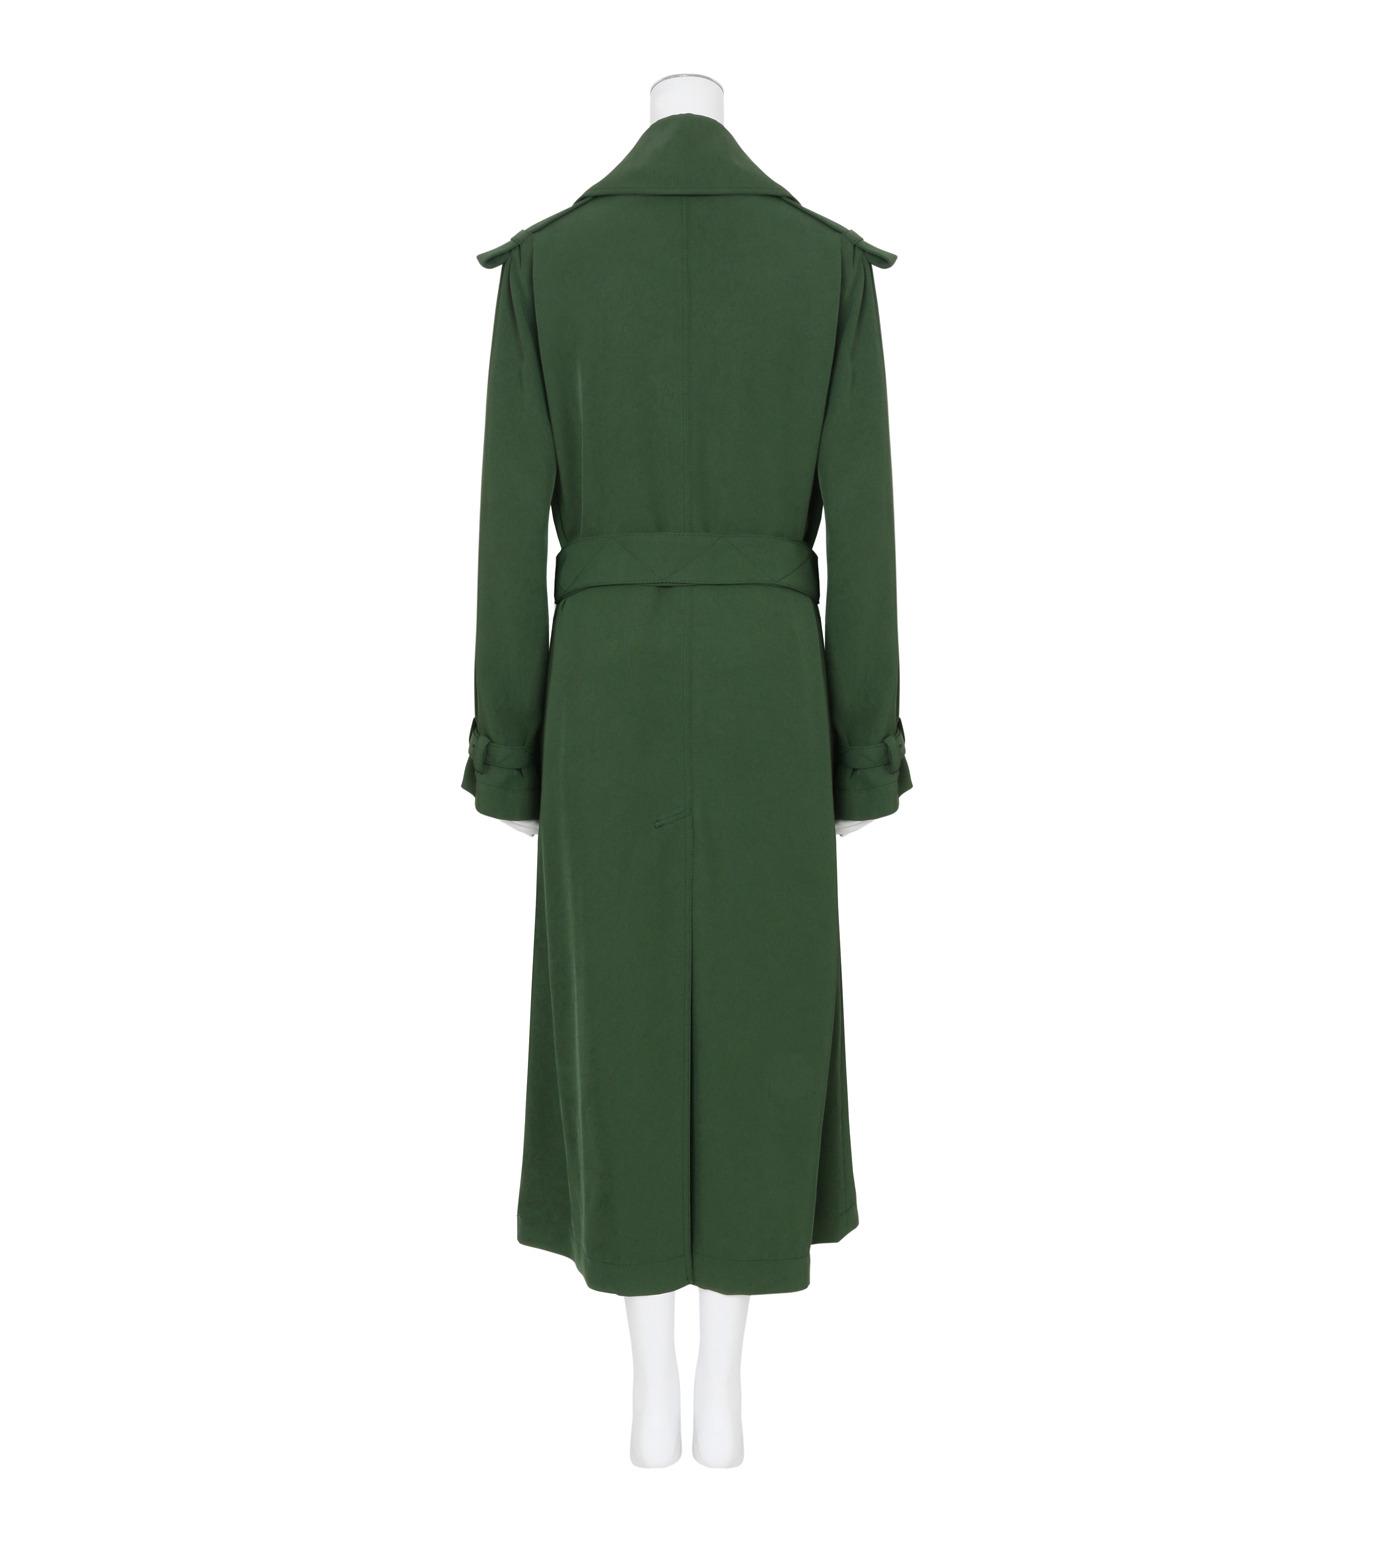 ACNE STUDIOS(アクネ ストゥディオズ)のTrench Coat-GREEN(コート/coat)-12N166-22 拡大詳細画像2